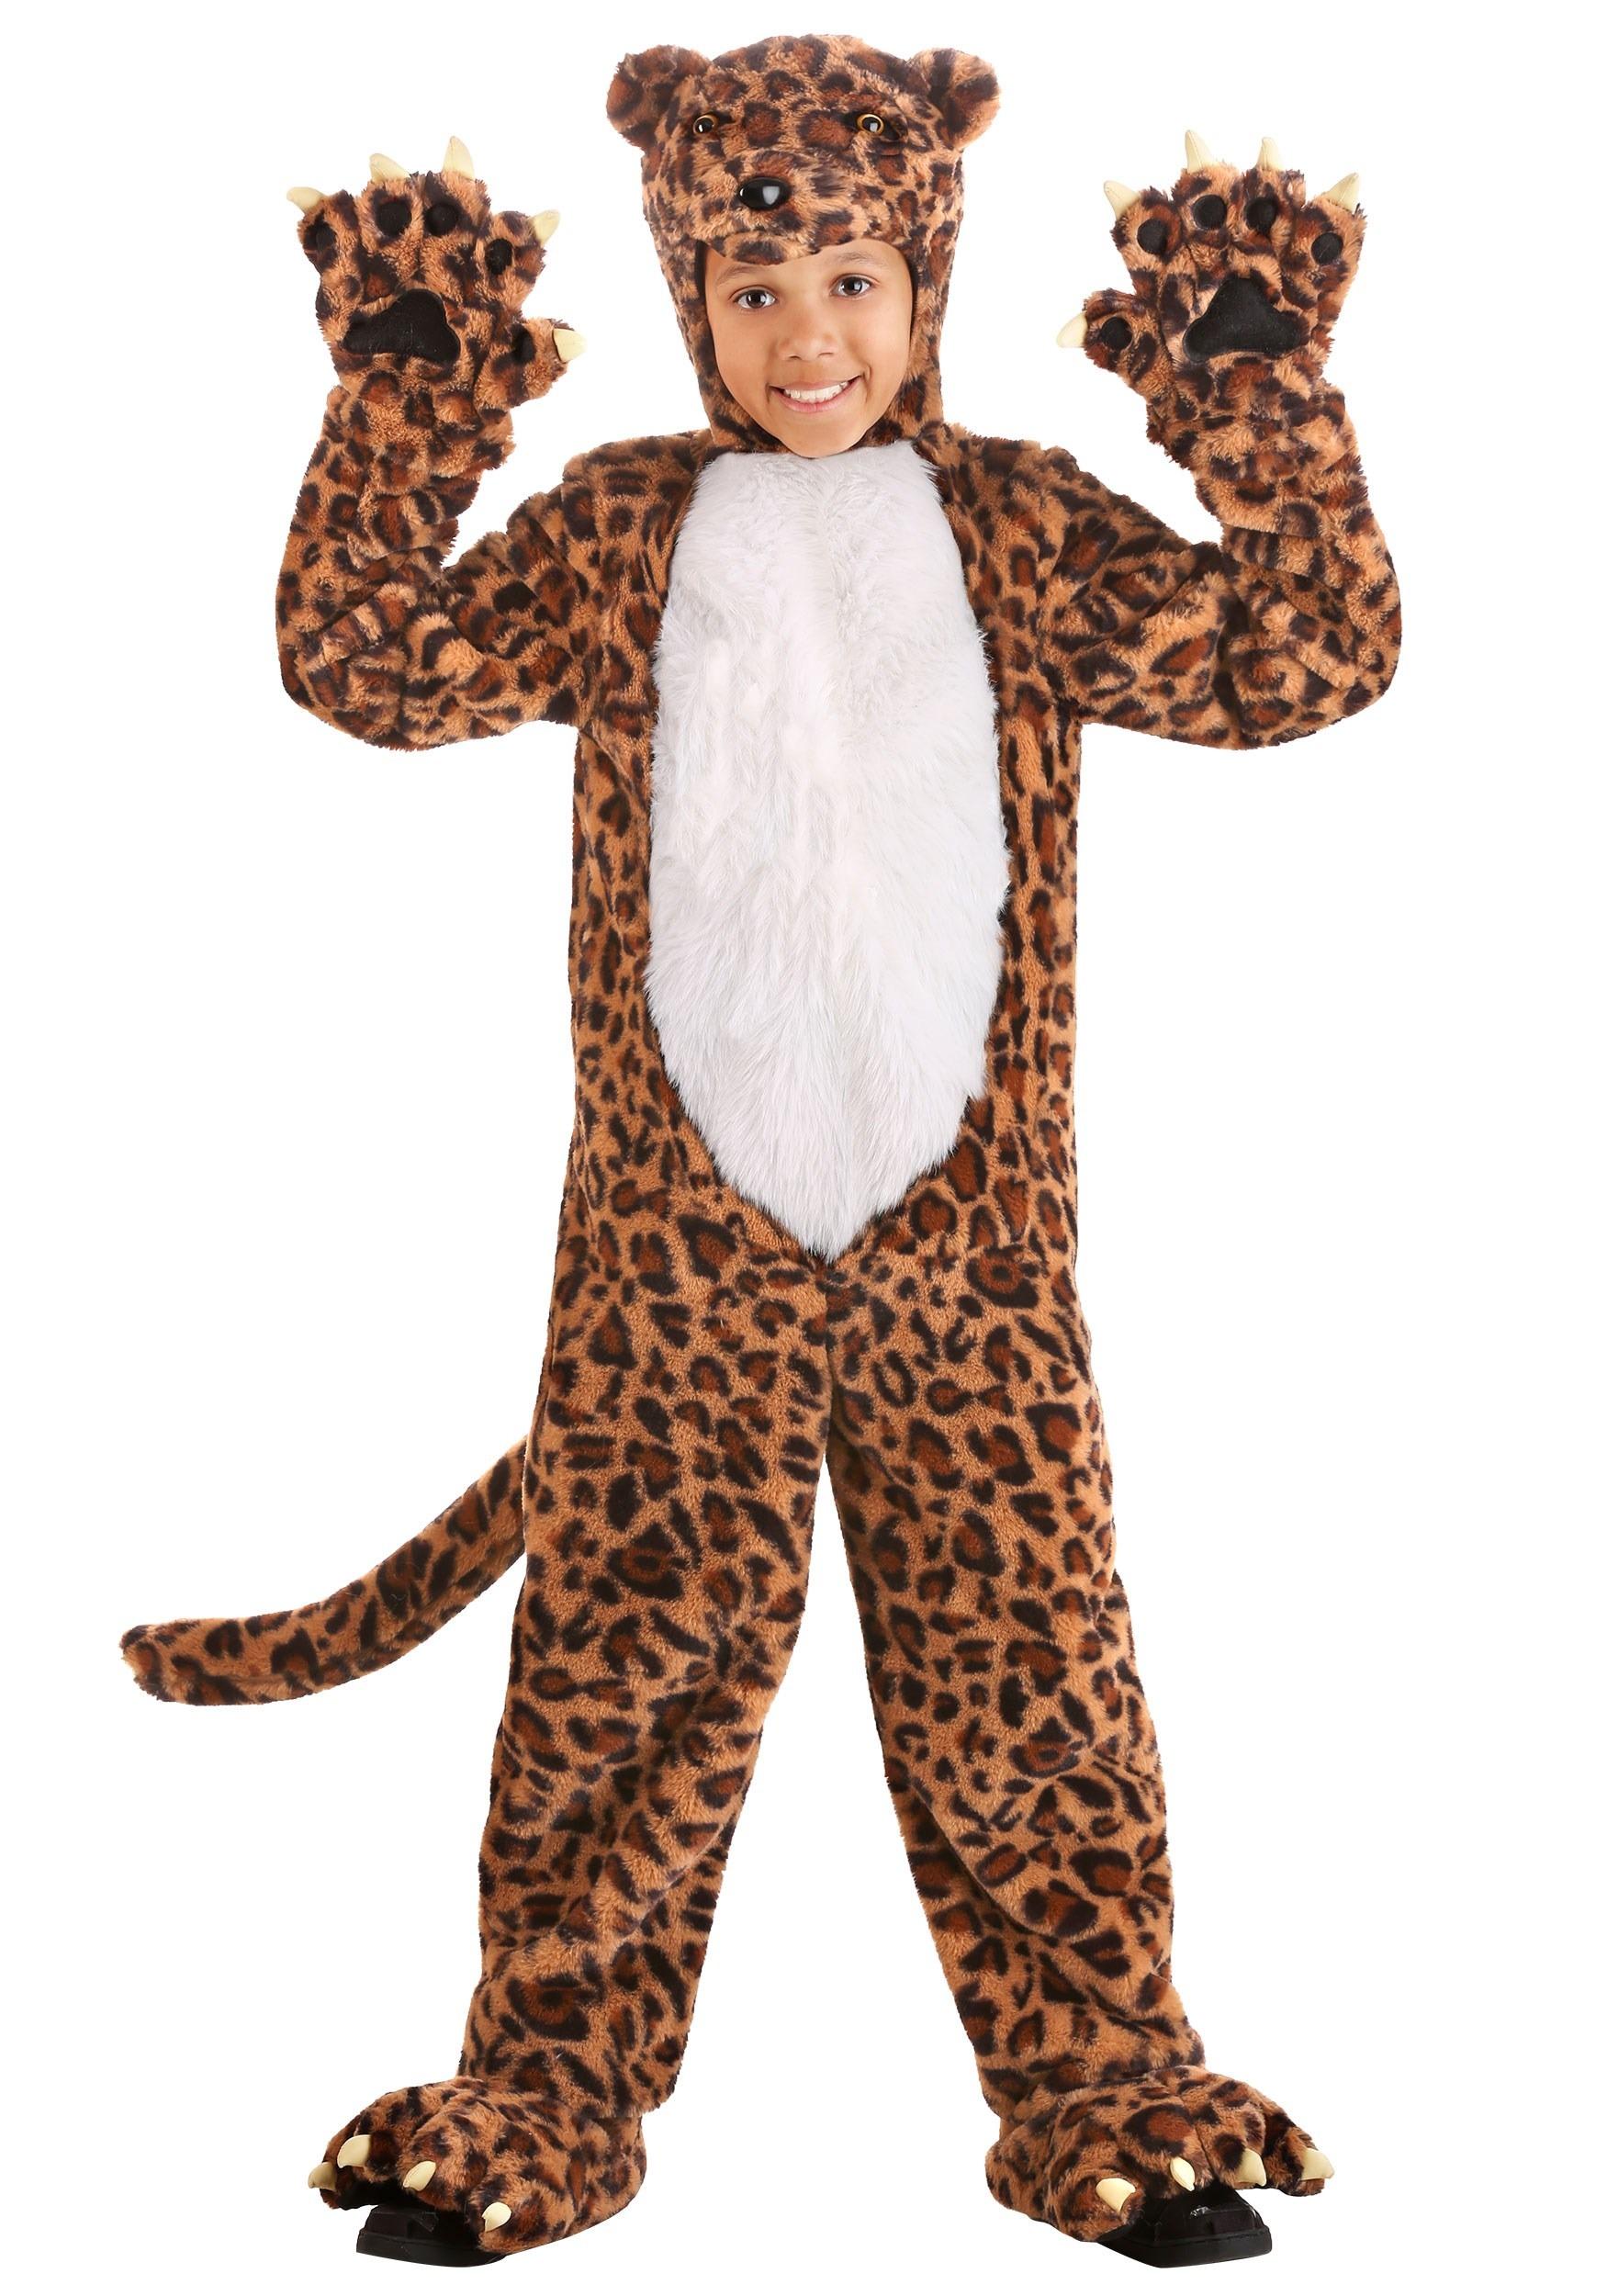 Leapin' Leopard Child's Costume